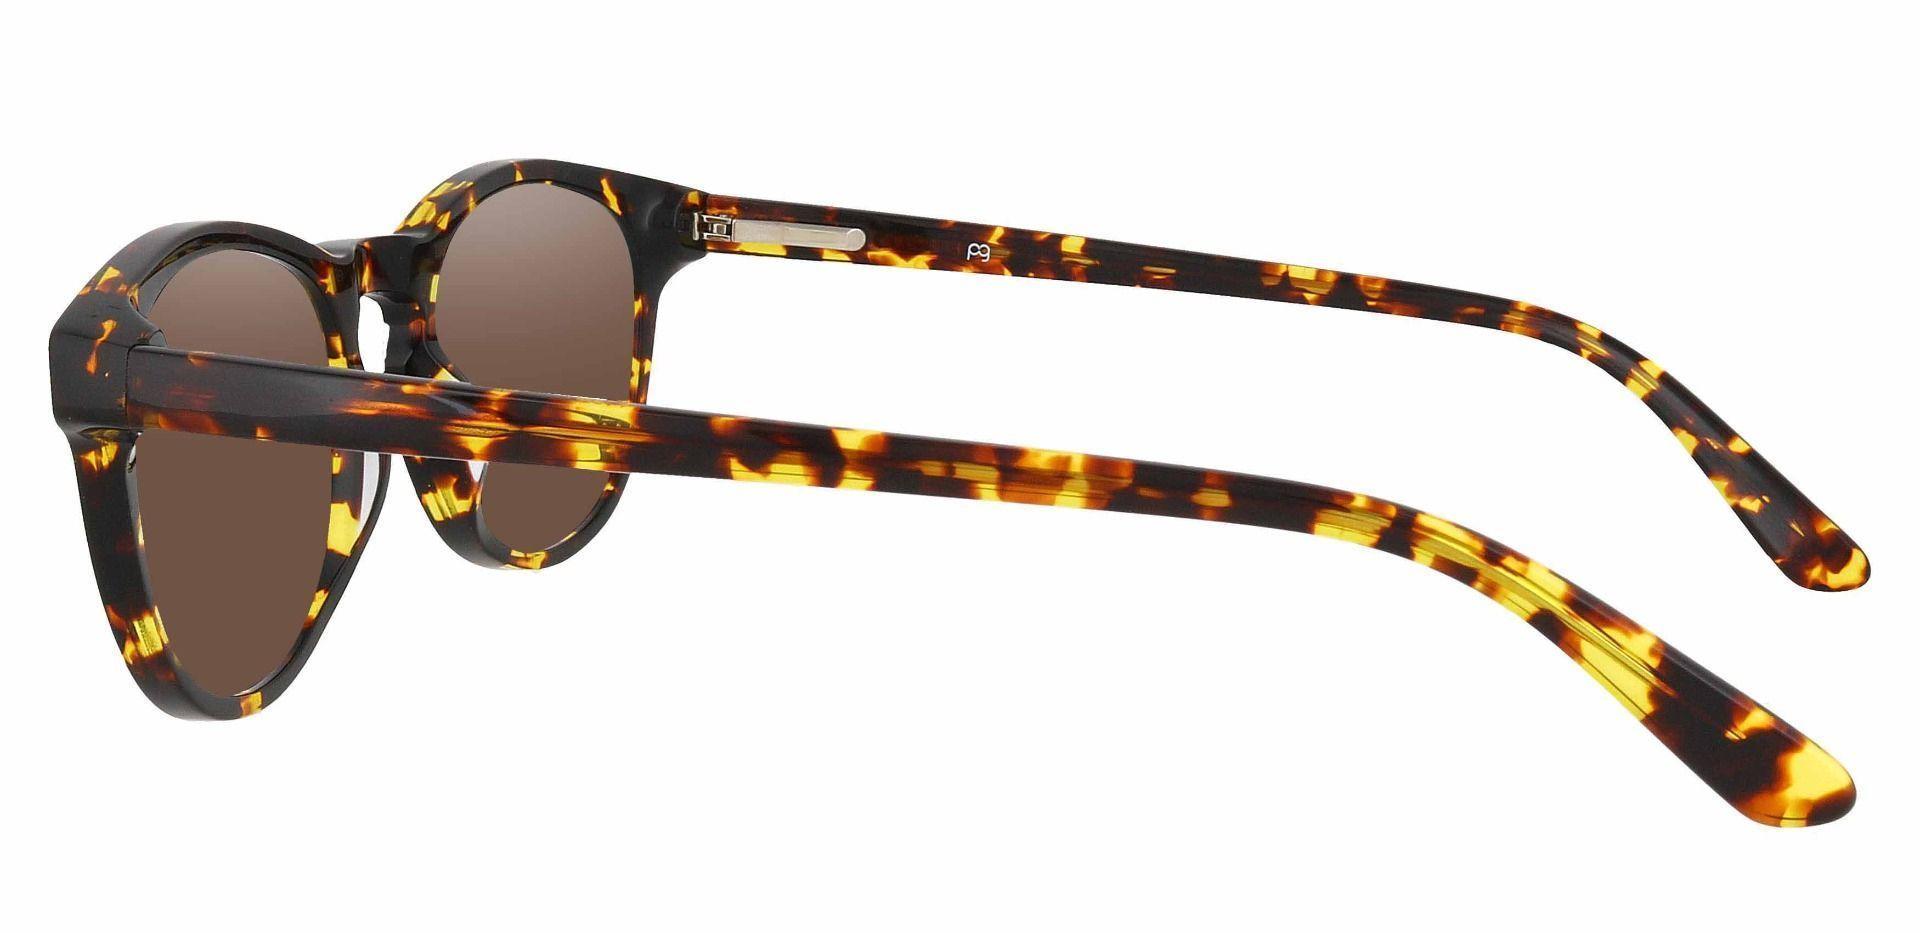 Laguna Oval Non-Rx Sunglasses - Tortoise Frame With Brown Lenses